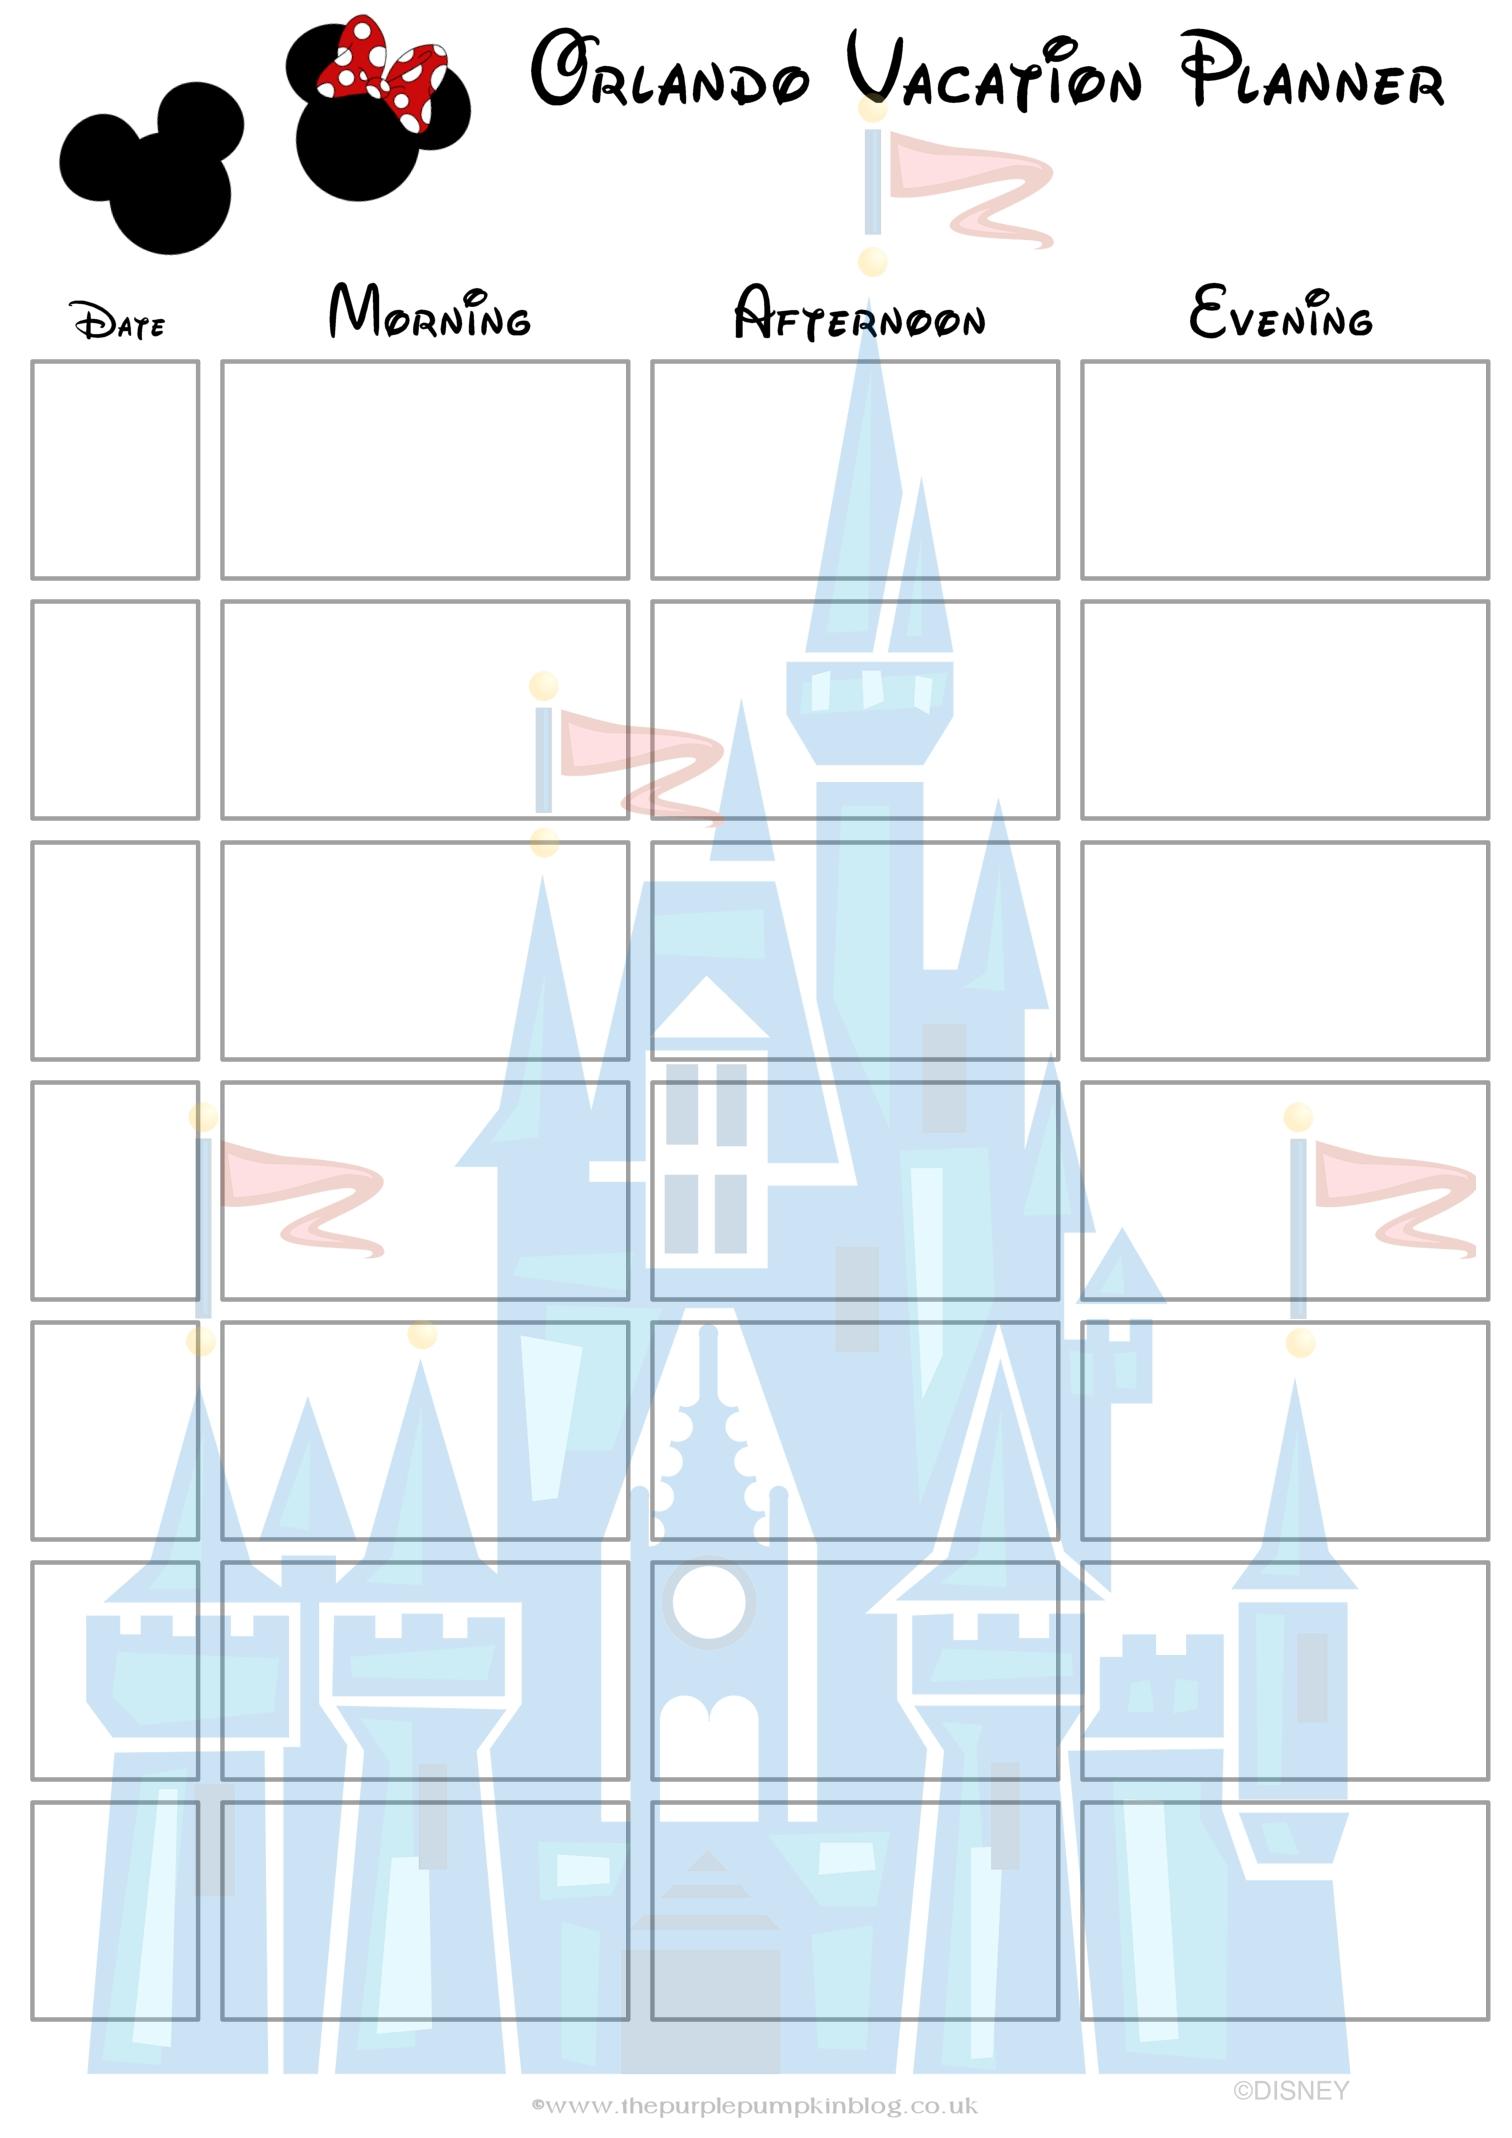 Orlando Walt Disney World Vacation Planner Free Printable  Xjb